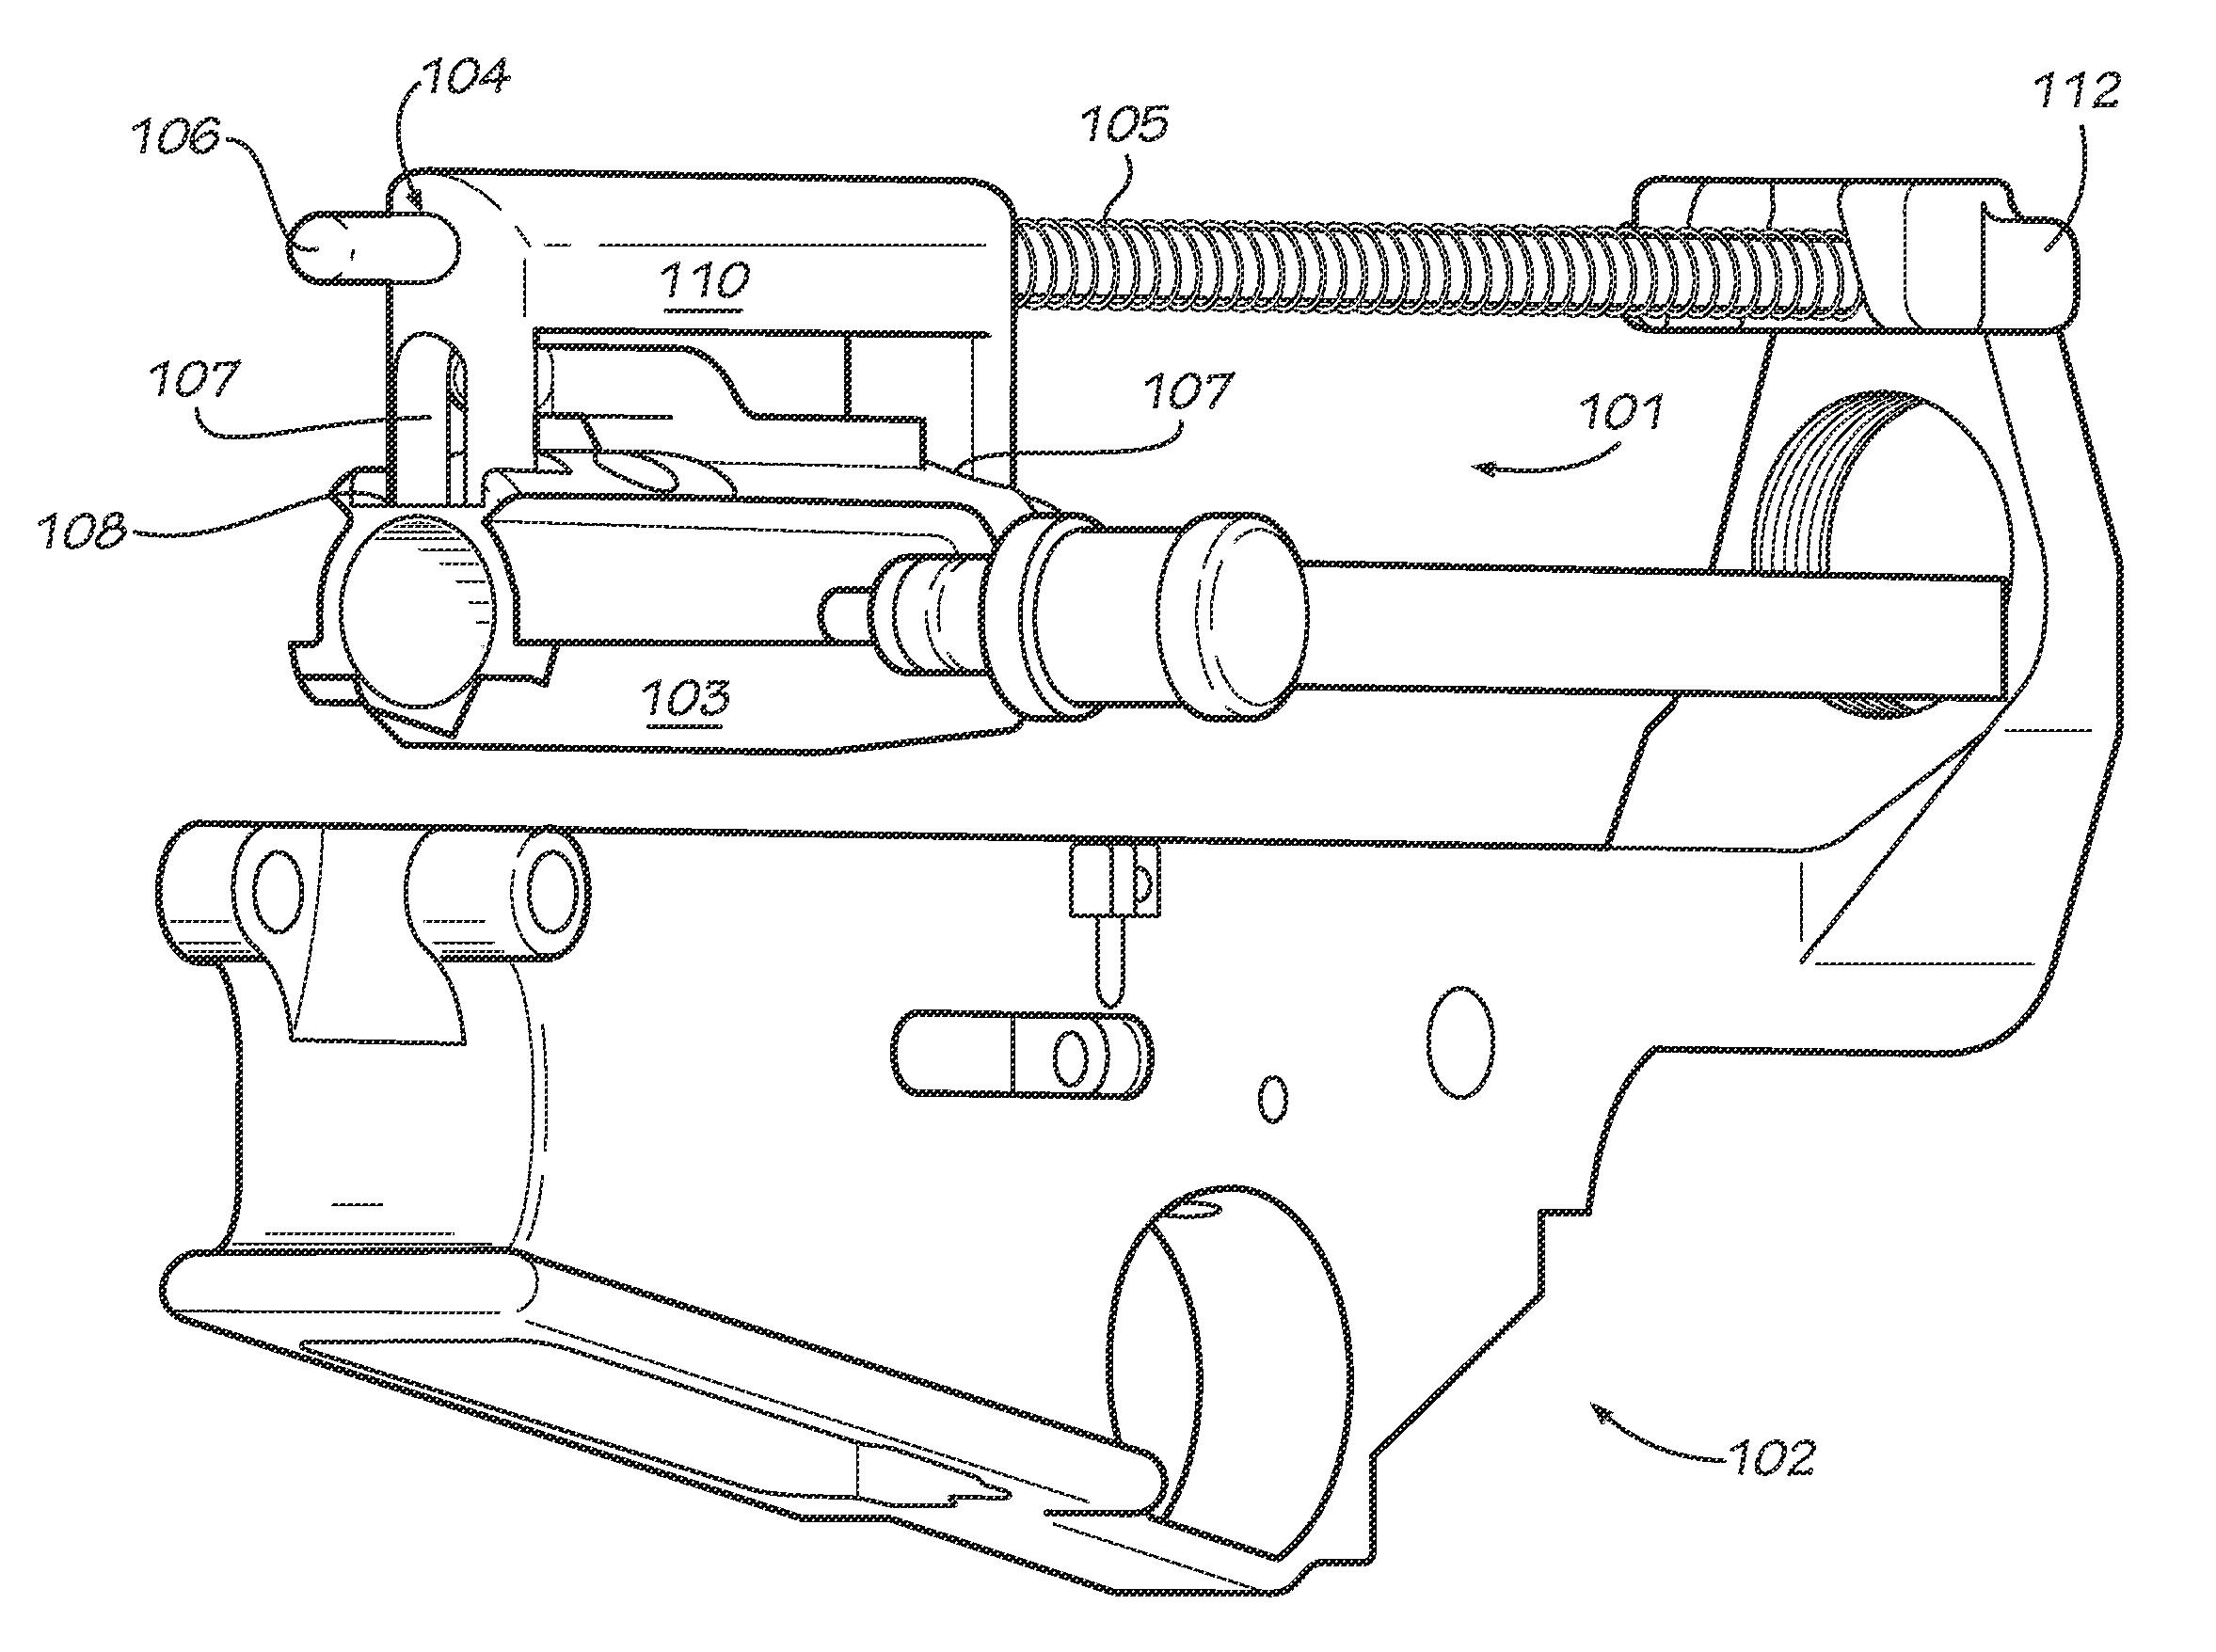 M16 Drawing